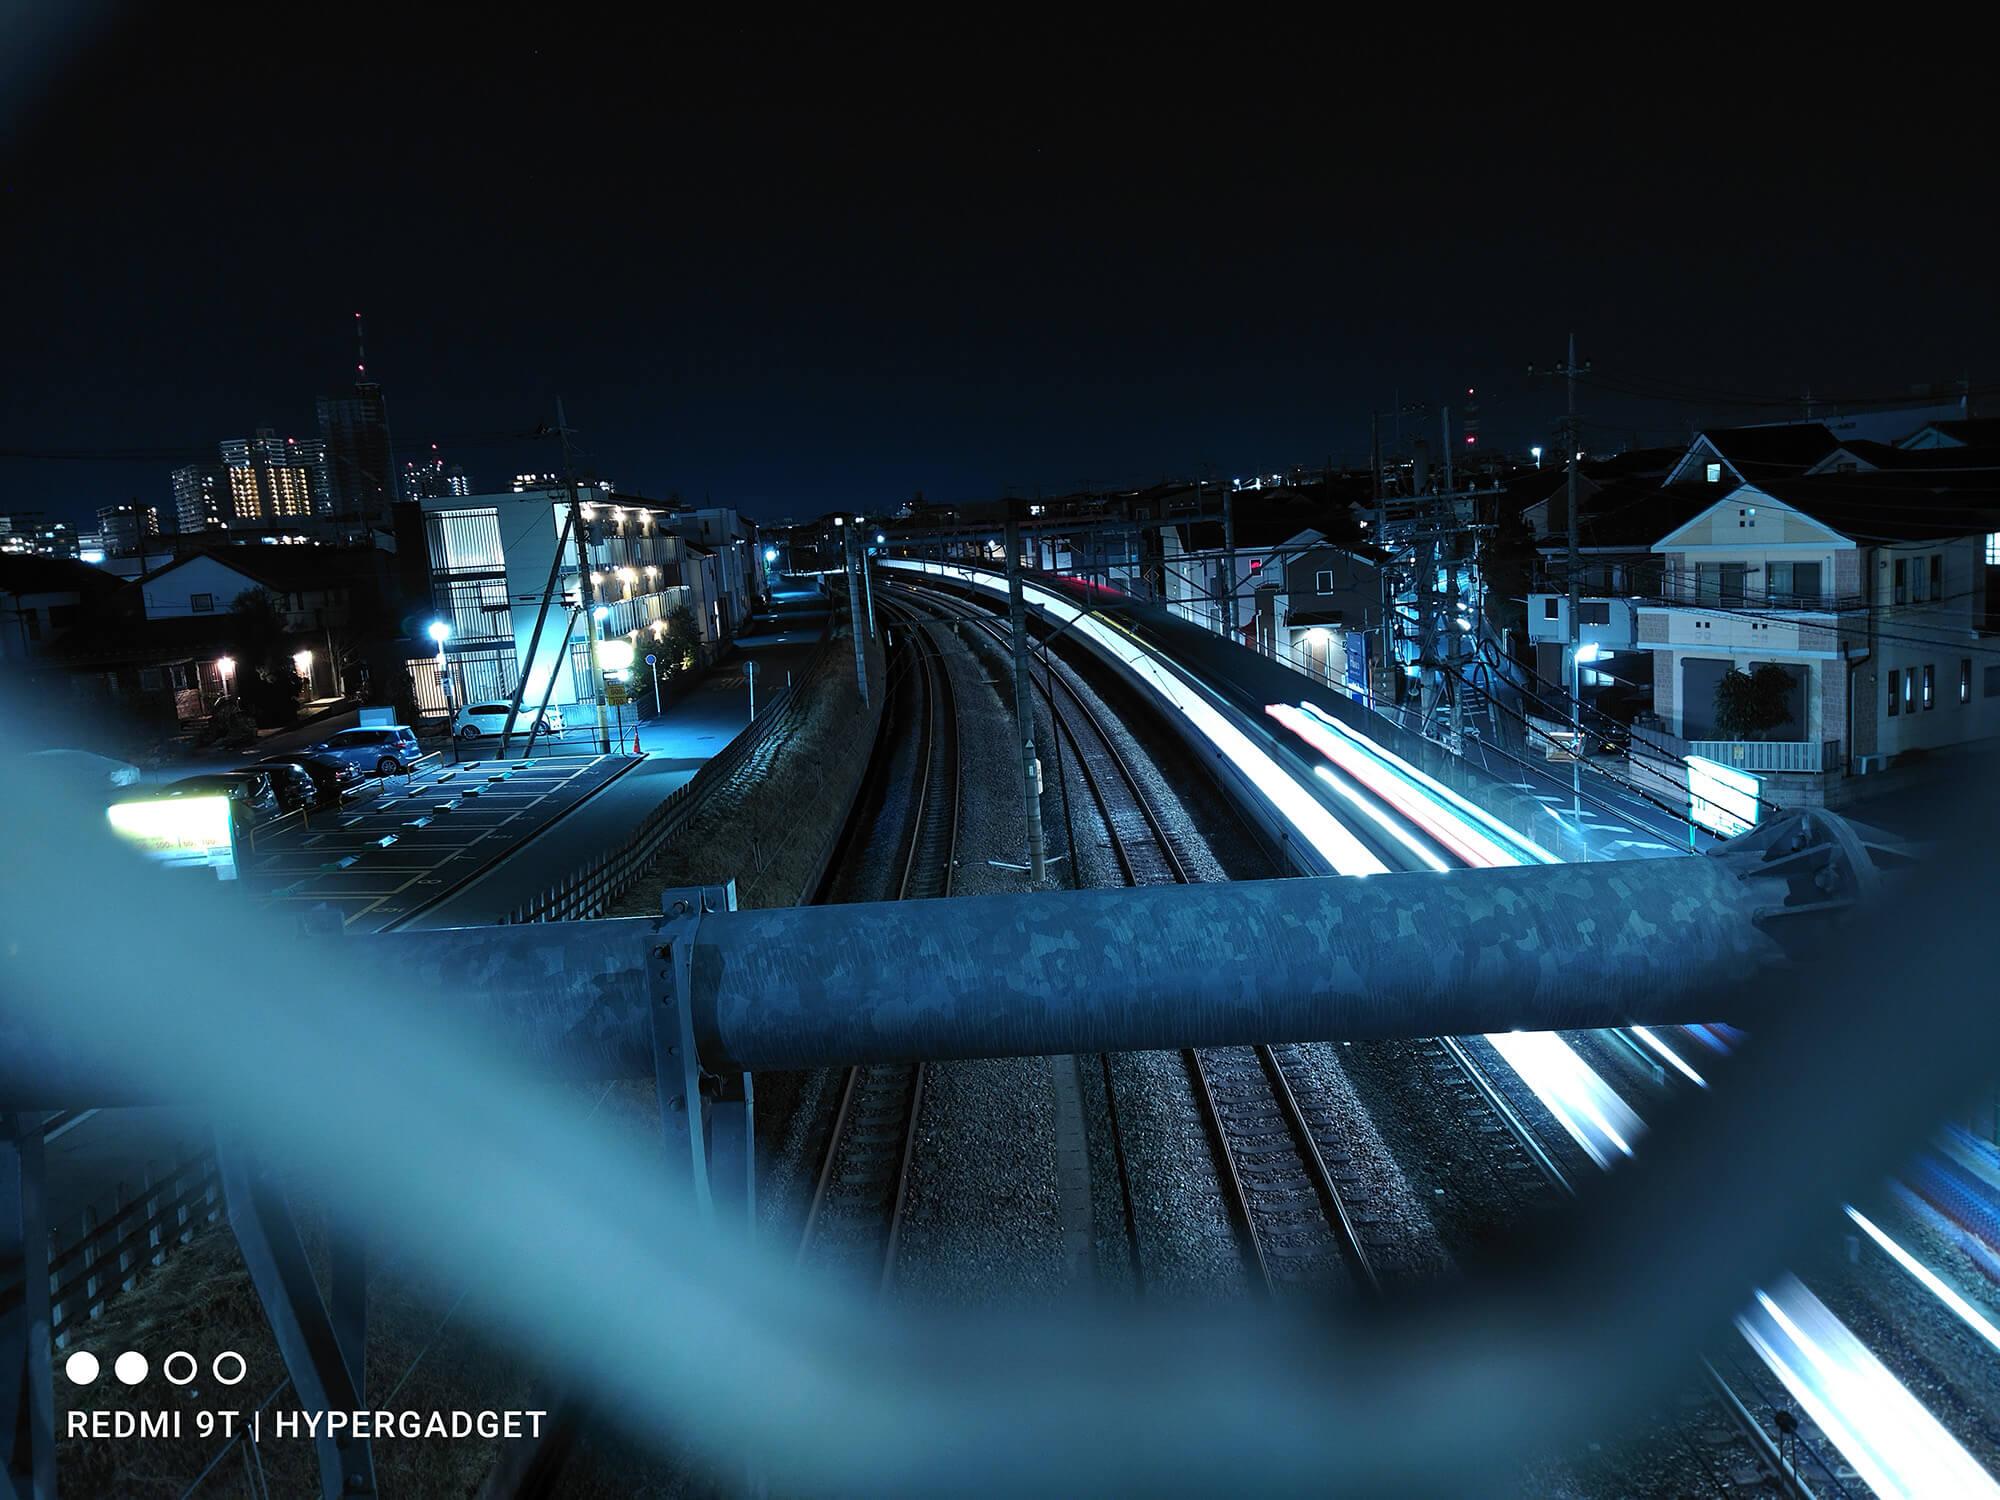 Redmi 9Tのプロモードを使って撮影した夜景画像